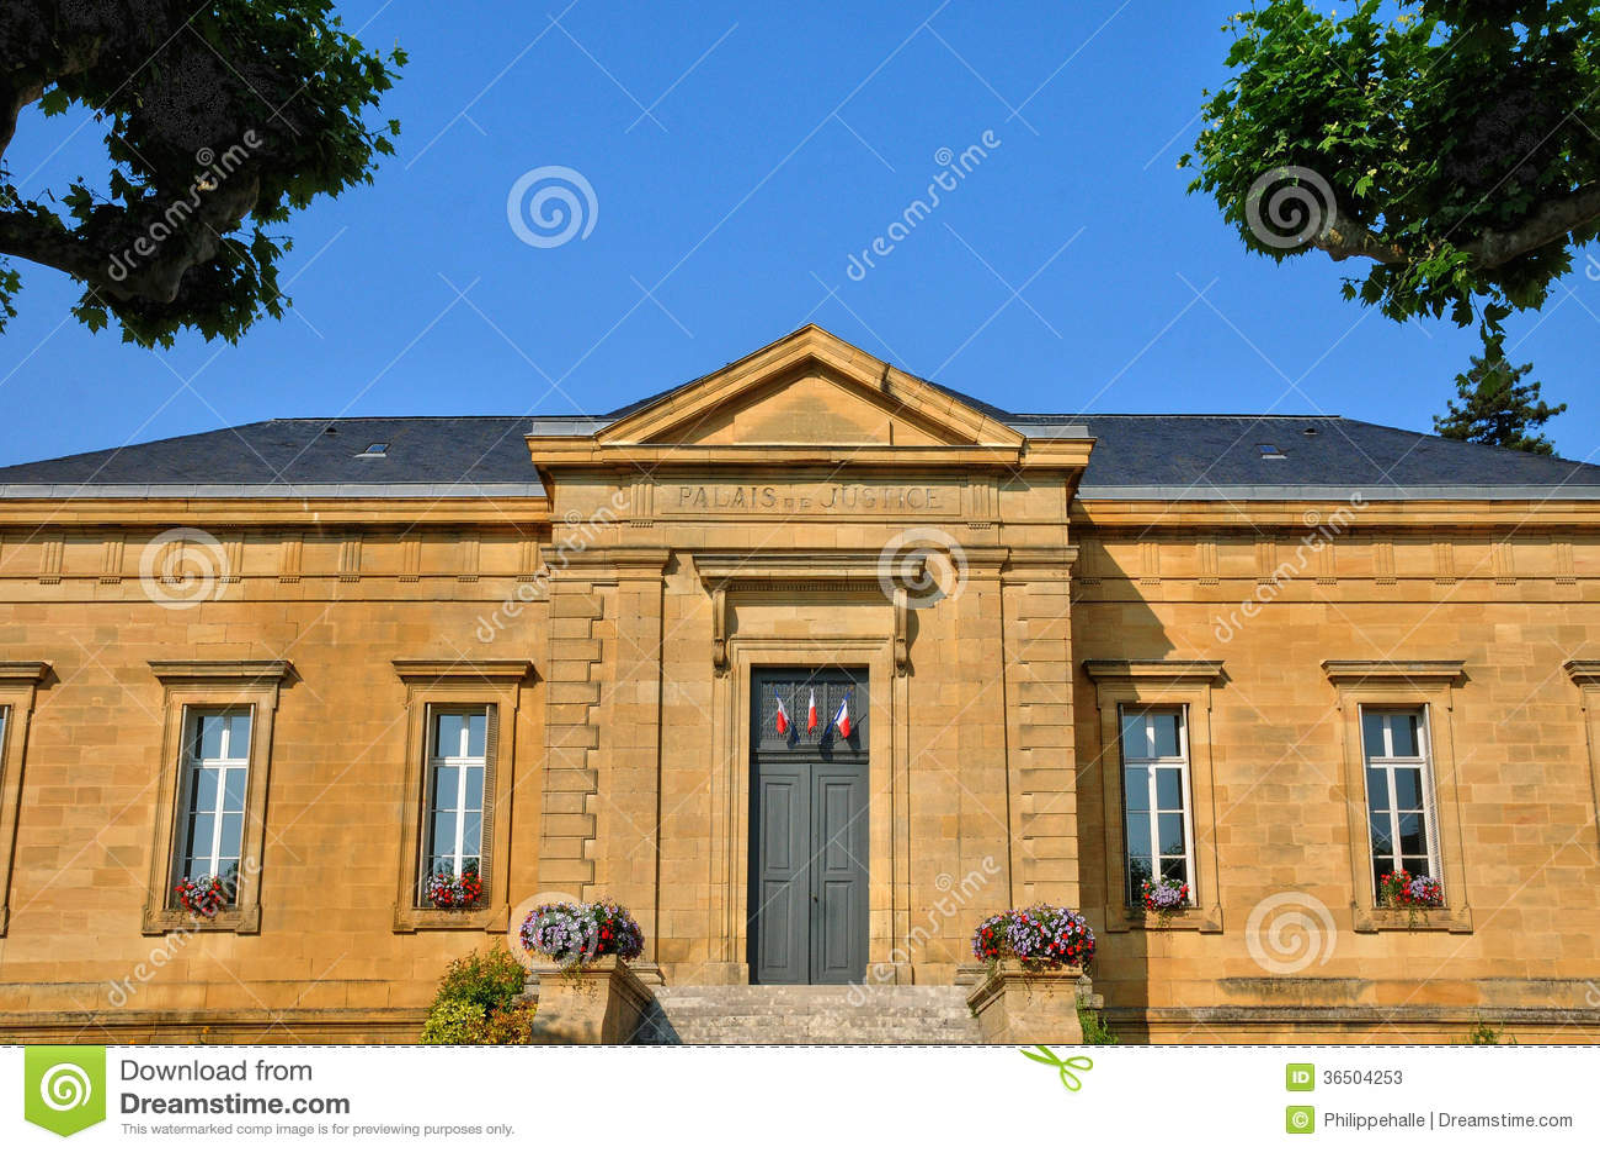 Perigord, le palais de justice de La Caneda de Sarlat dans Dordogne